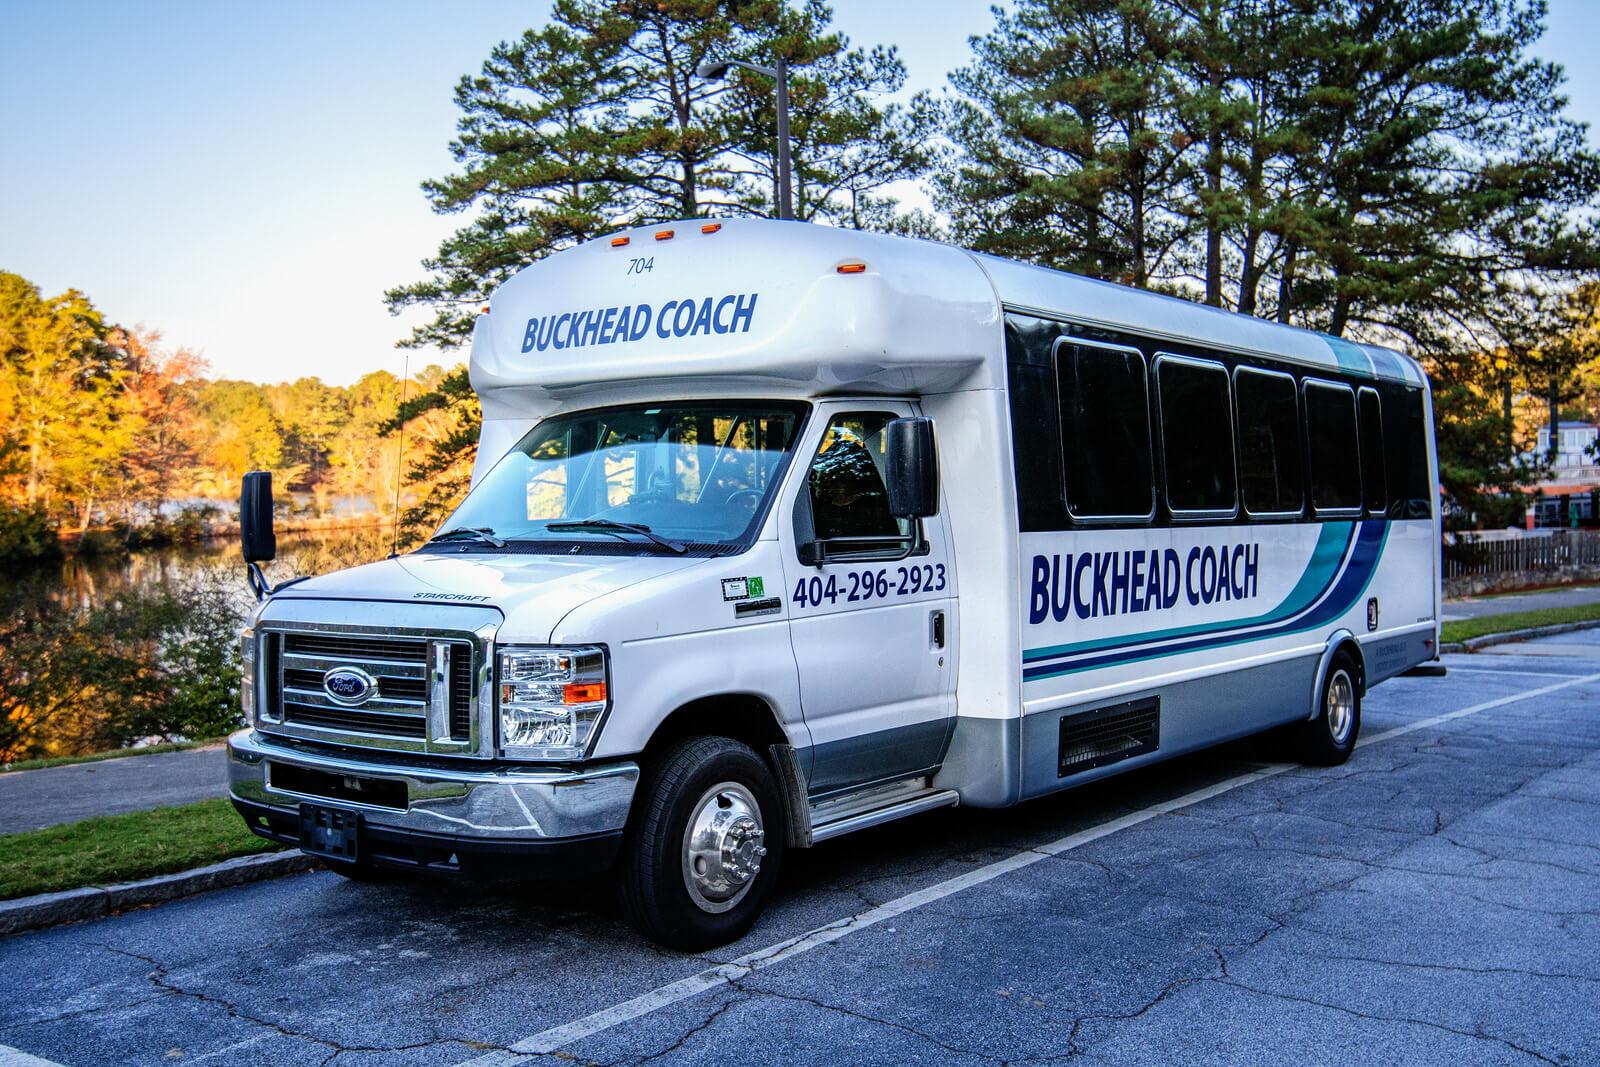 buckhead-coach-704-9